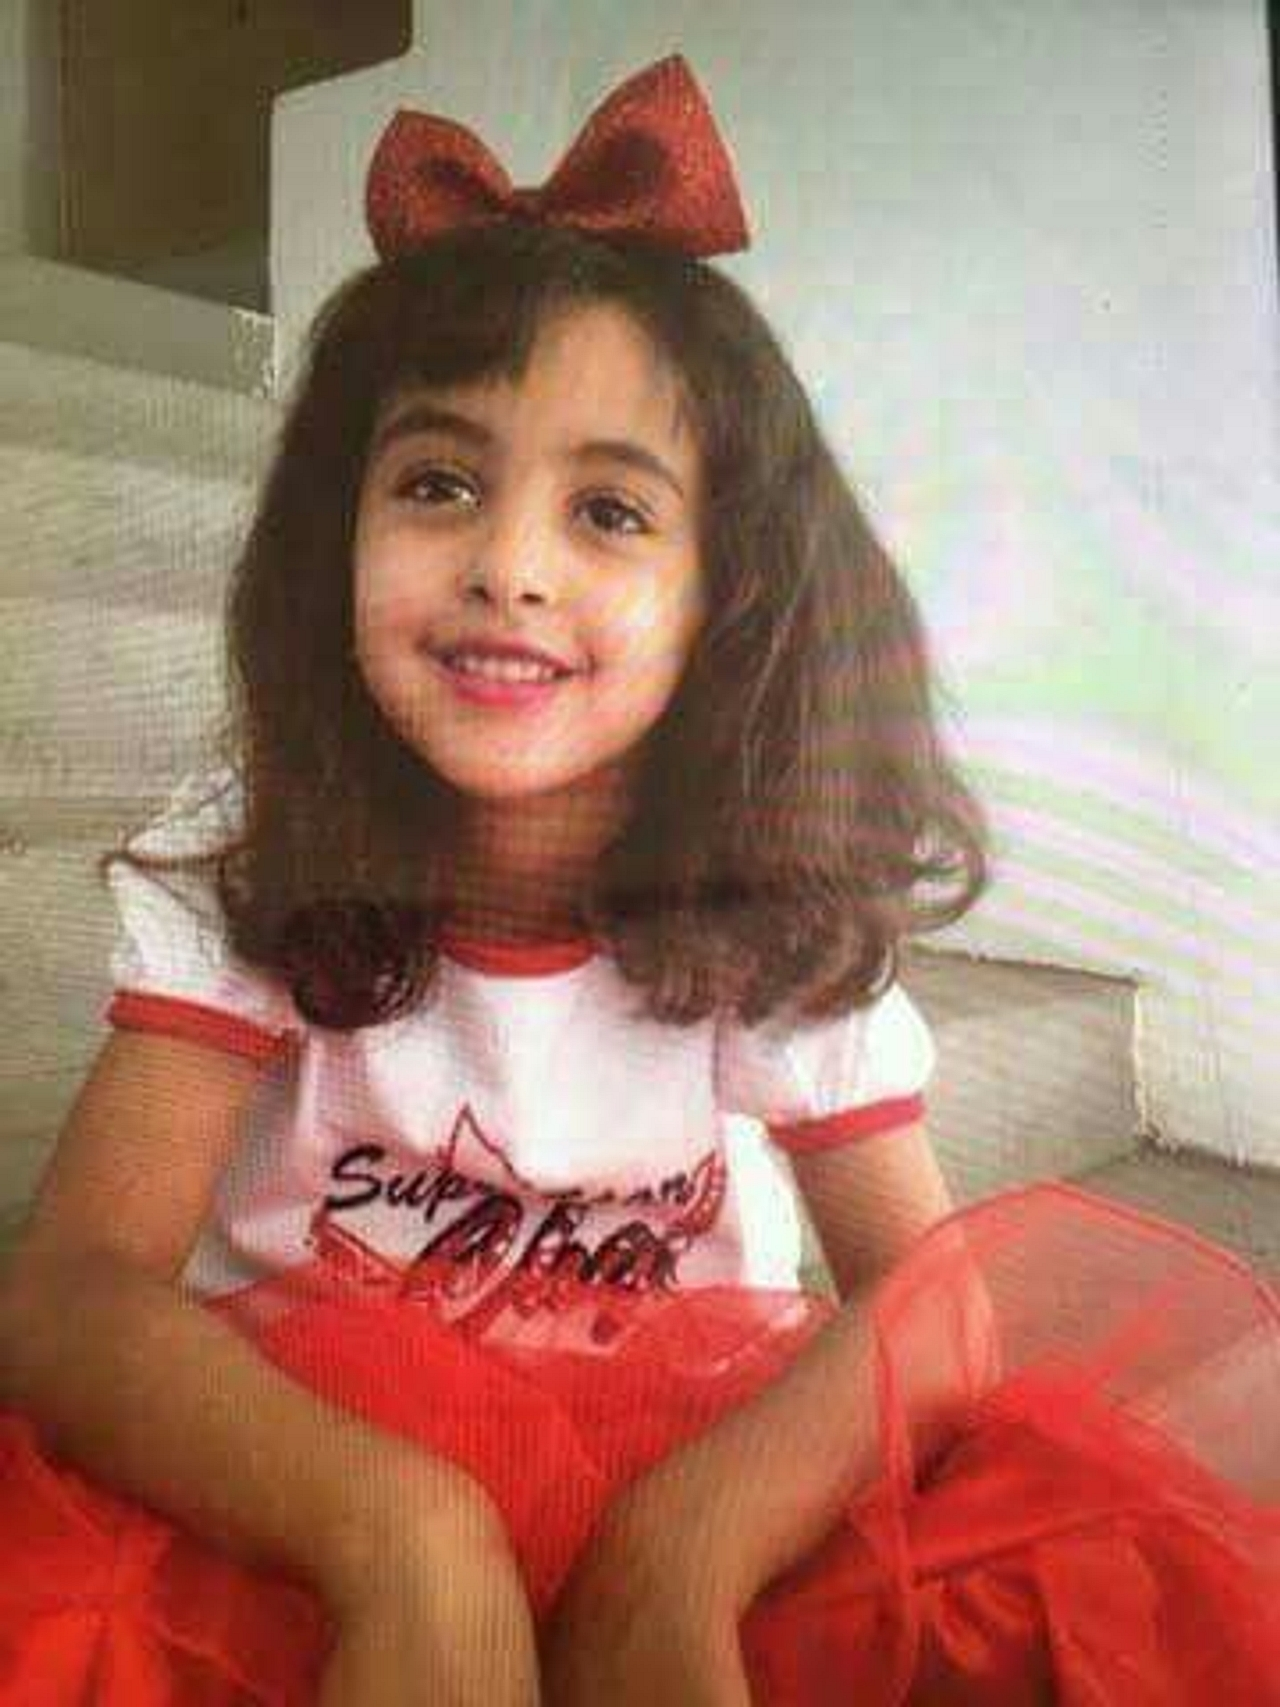 An image of Nawar al-Awlaki, killed in the 2017 Yakla air strike